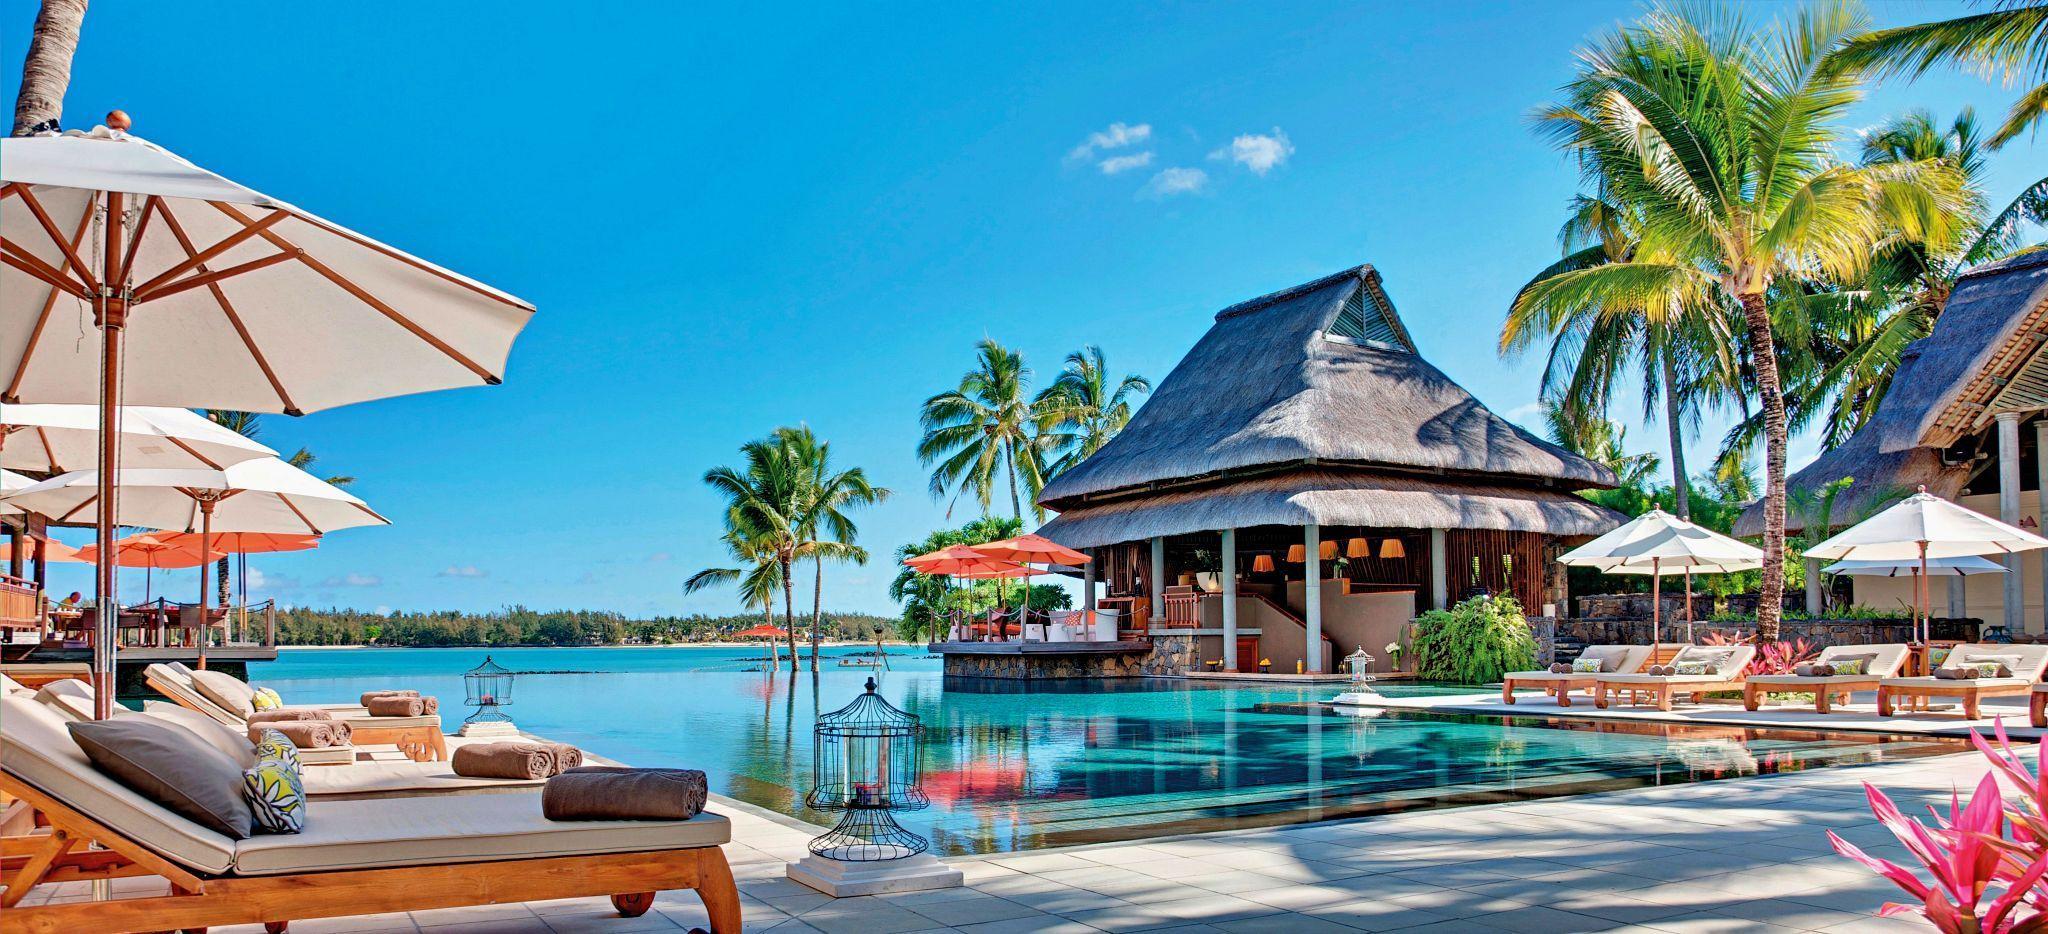 Der Hauptpoolbereich des Hotels Constance Le Prince Maurice auf Mauritius